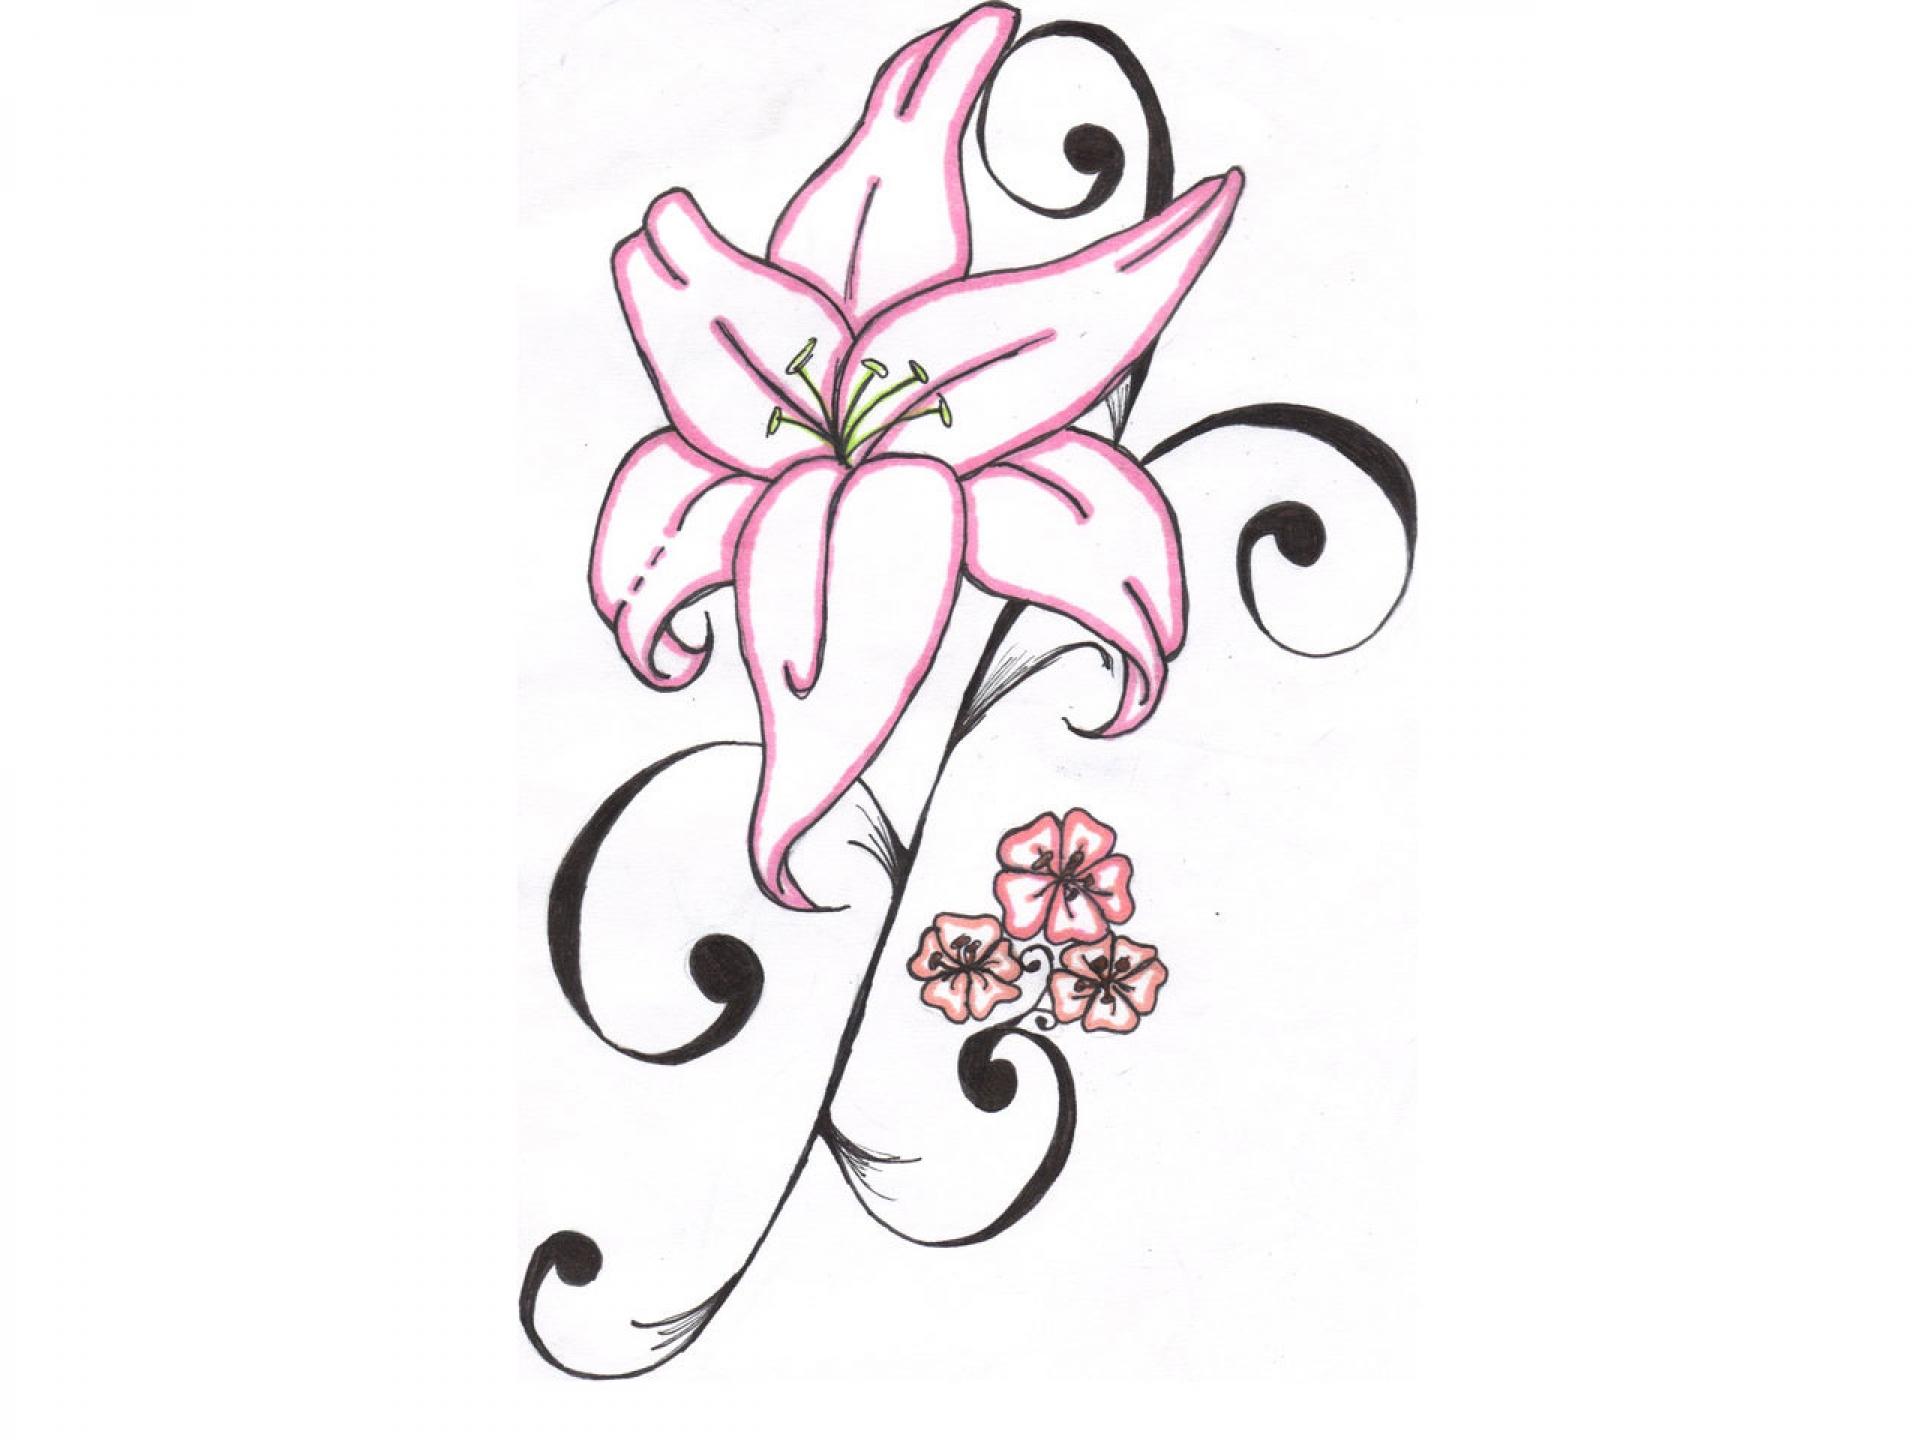 cartoon lily flower. Black Bedroom Furniture Sets. Home Design Ideas